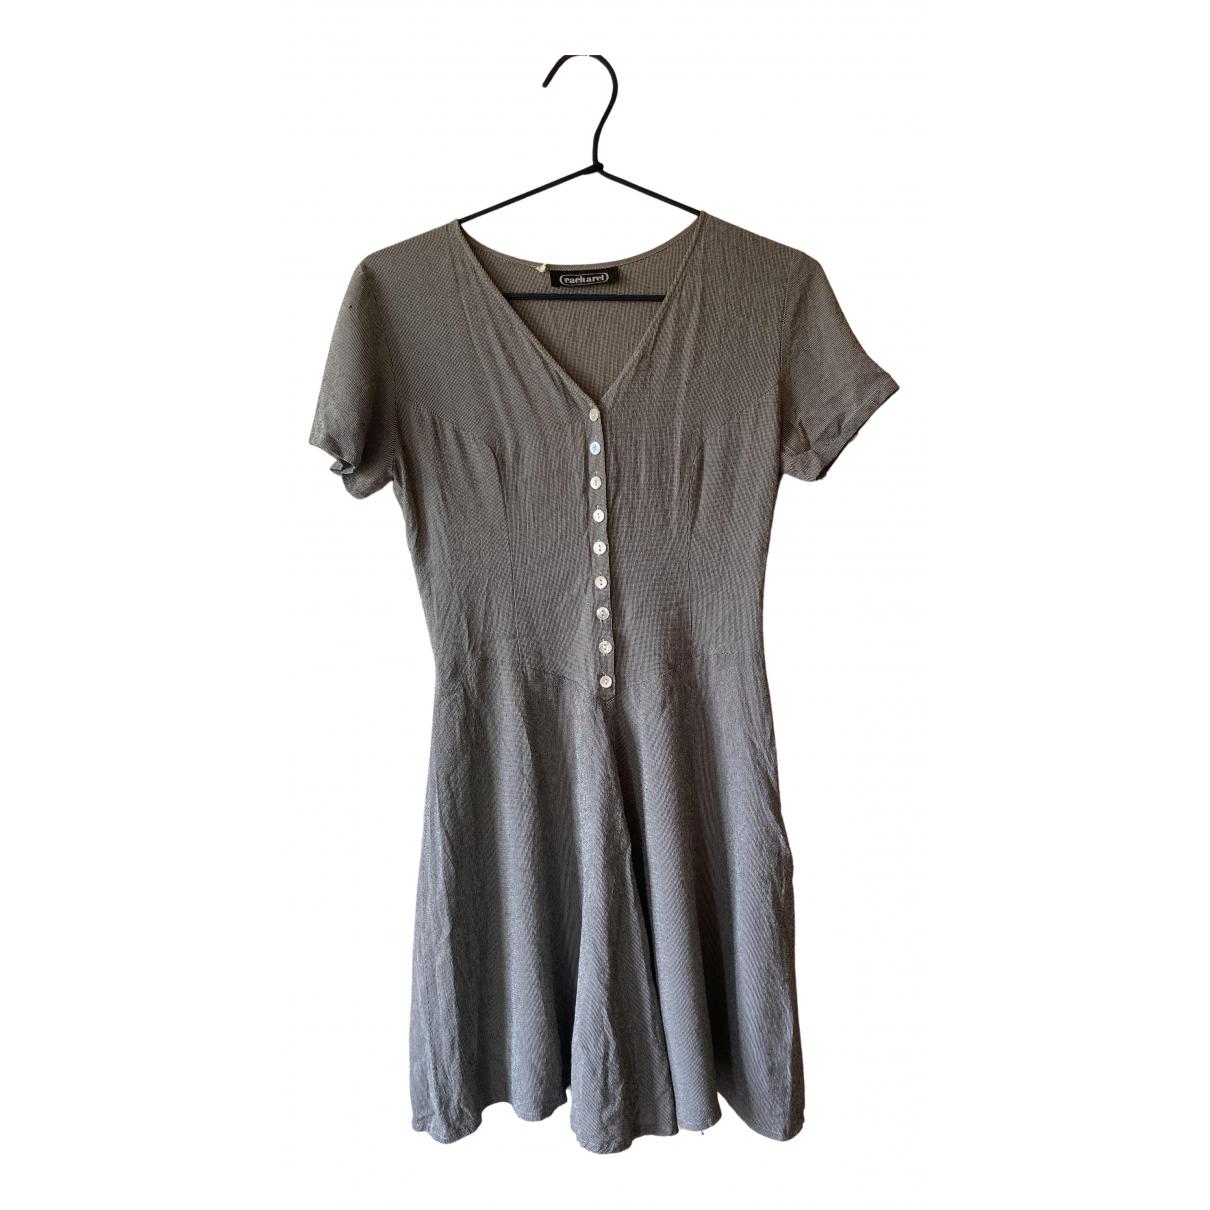 Cacharel \N Grey dress for Women 36 FR